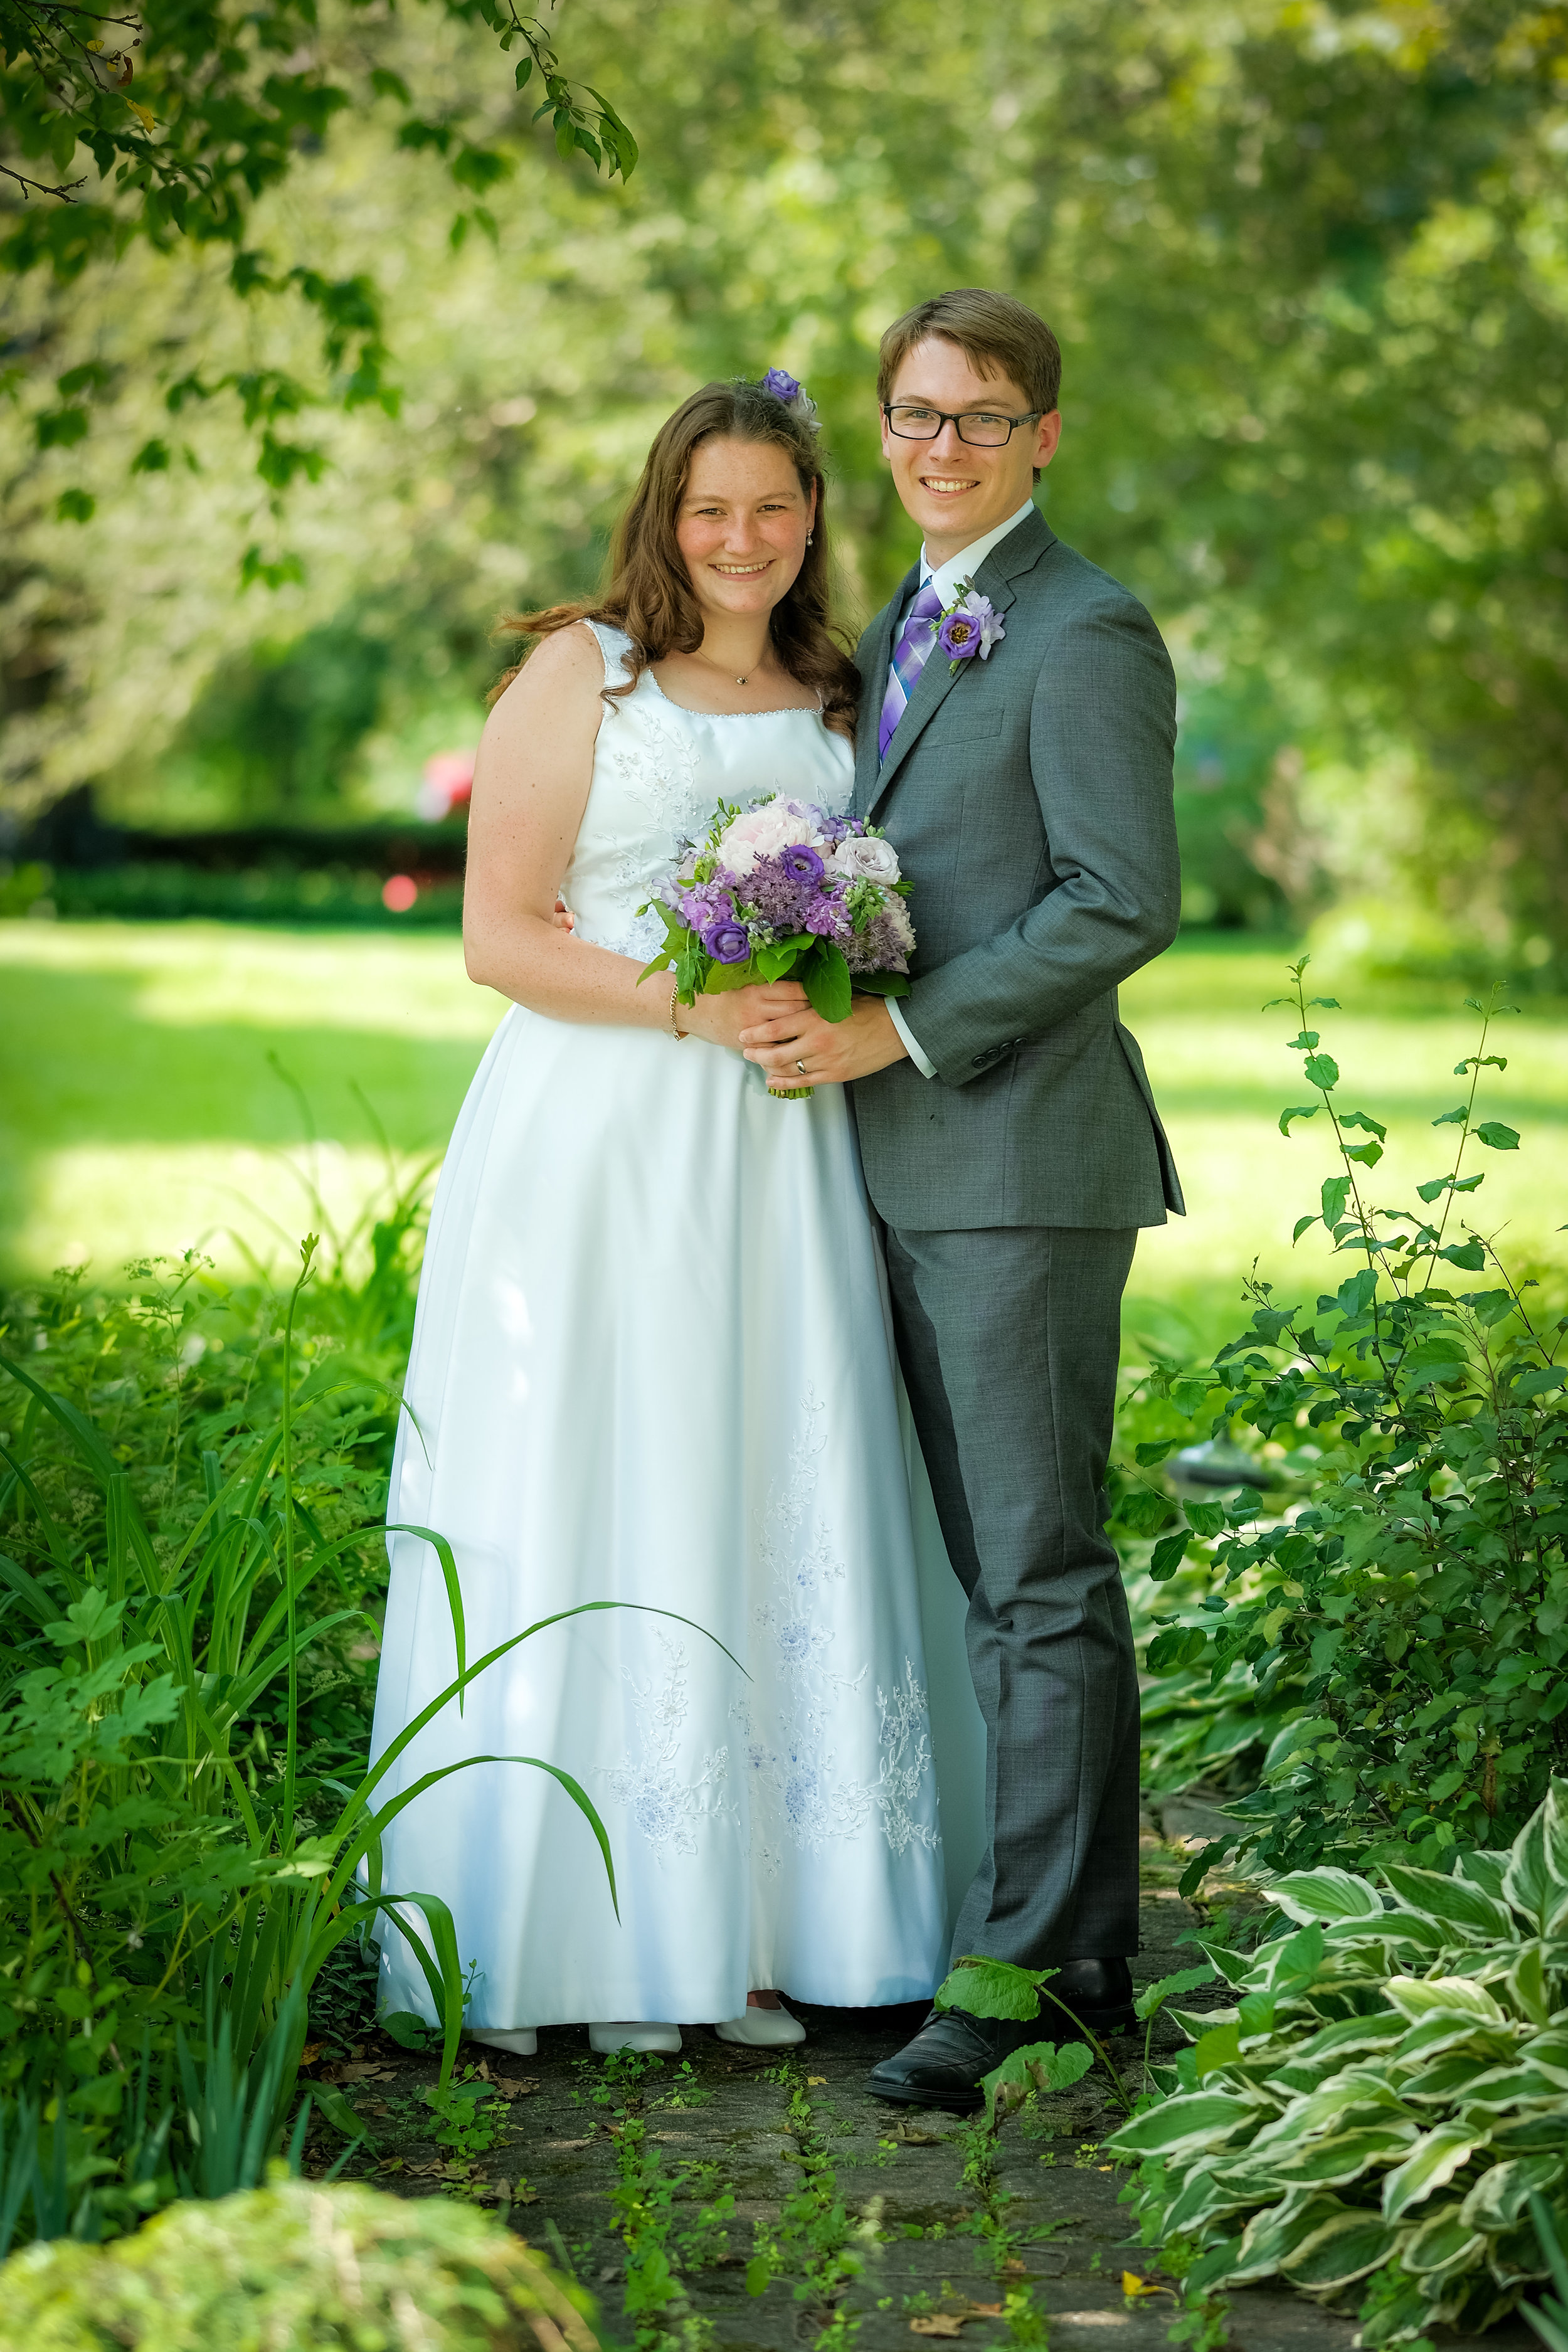 Vermont-Lilac-Inn-Wedding-Photography-712.jpg